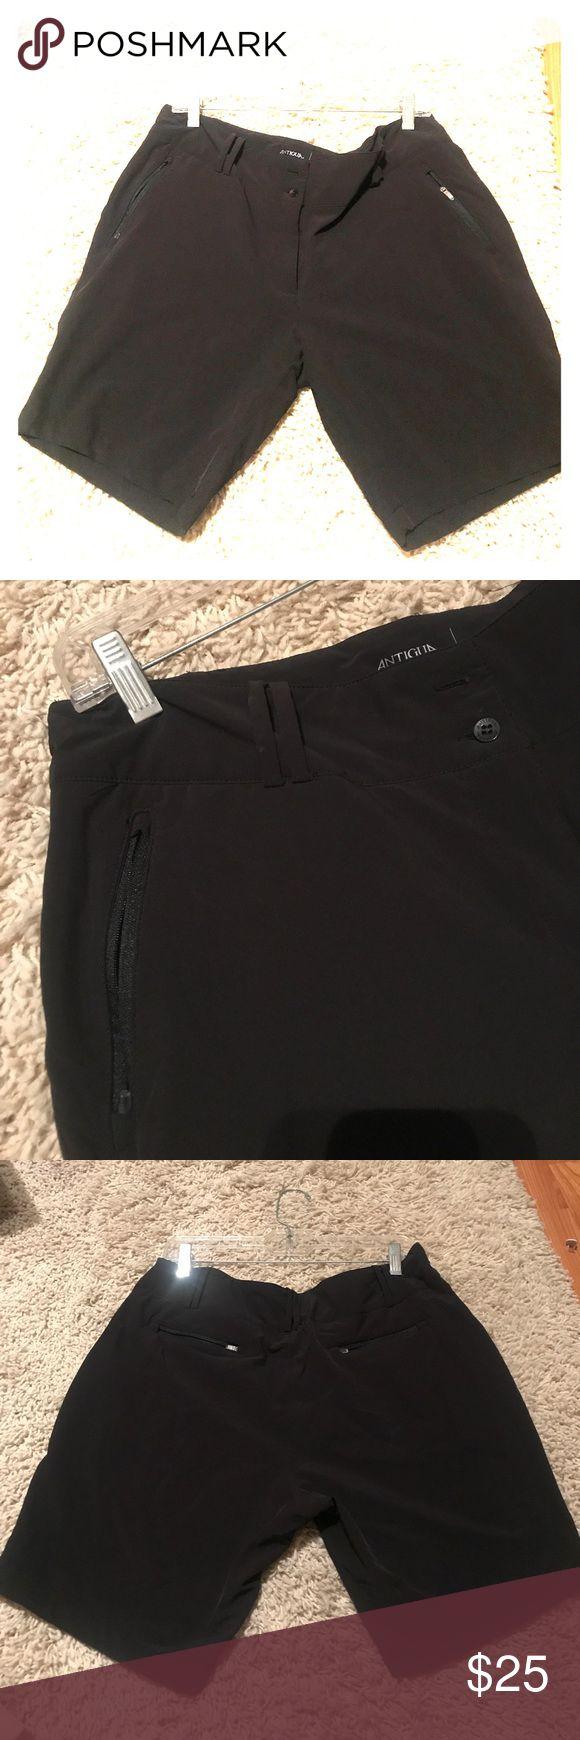 Antigua Bermuda golf shorts ( new) Brand new never worn black womens golf Bermuda shorts. Polyester blend allows for stretch. 2 back zipper pockets. 2 front zipper pockets. Belt loops. High quality Antigua . Antigua Shorts Bermudas